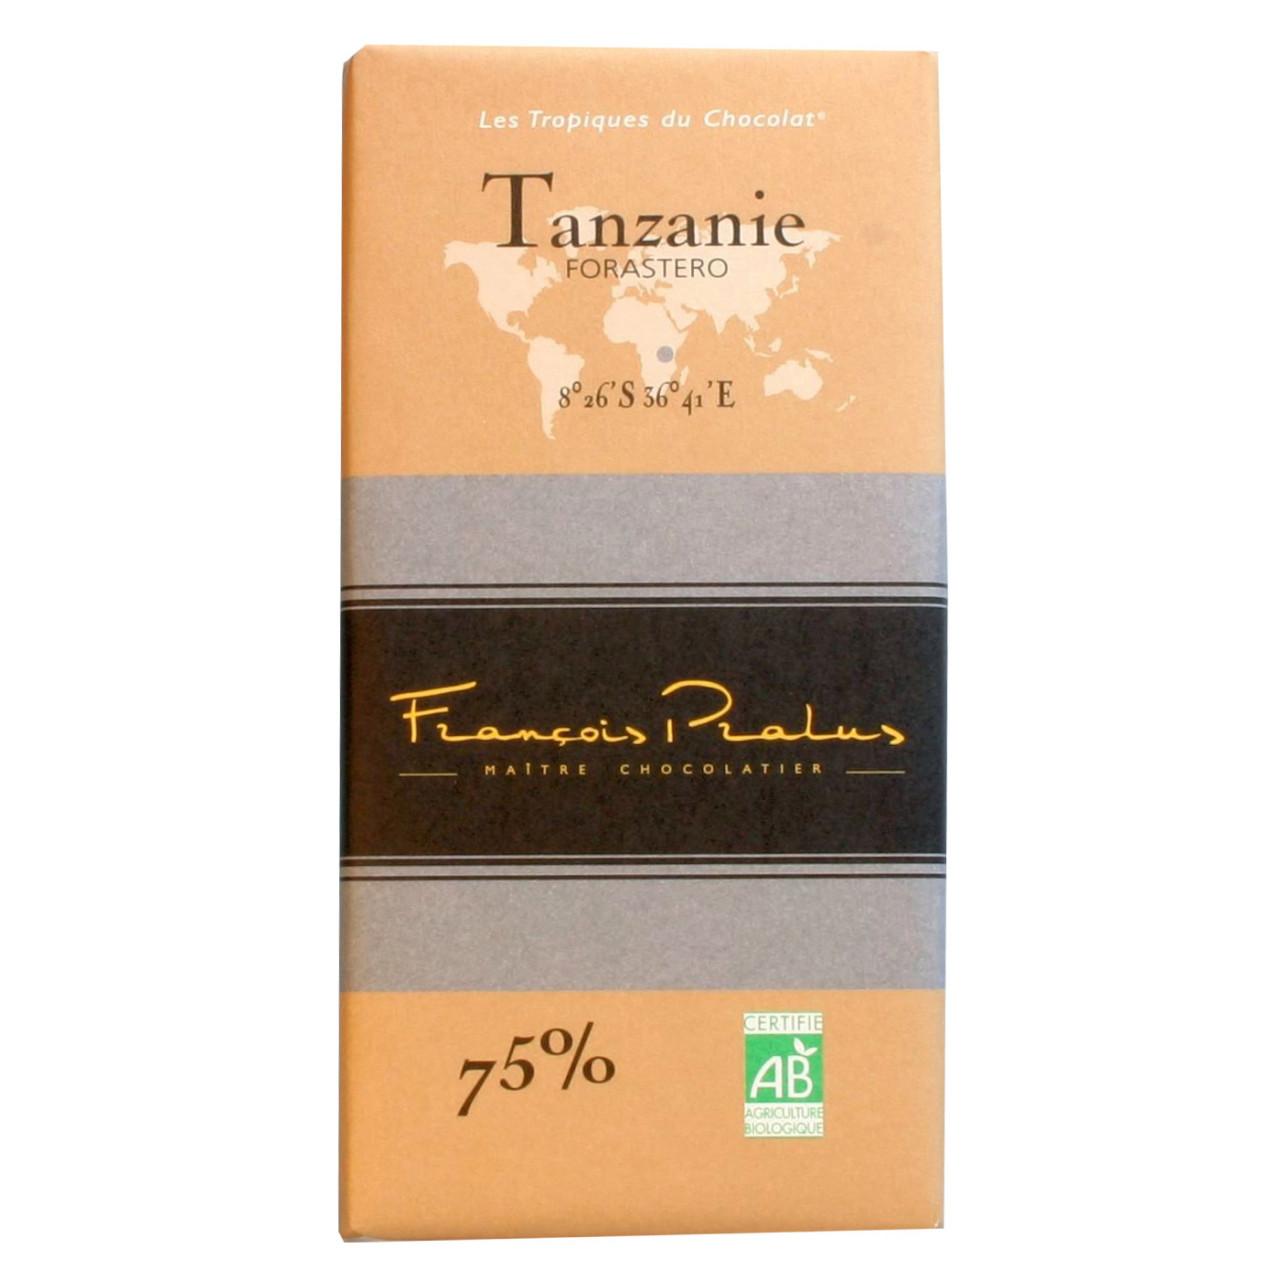 Pralus Frankreich dunkle Schokolade 75% Tansania Trinitario dark chocolate chocolat noir Afrika Africa Afrique - $seoKeywords- Chocolats-De-Luxe